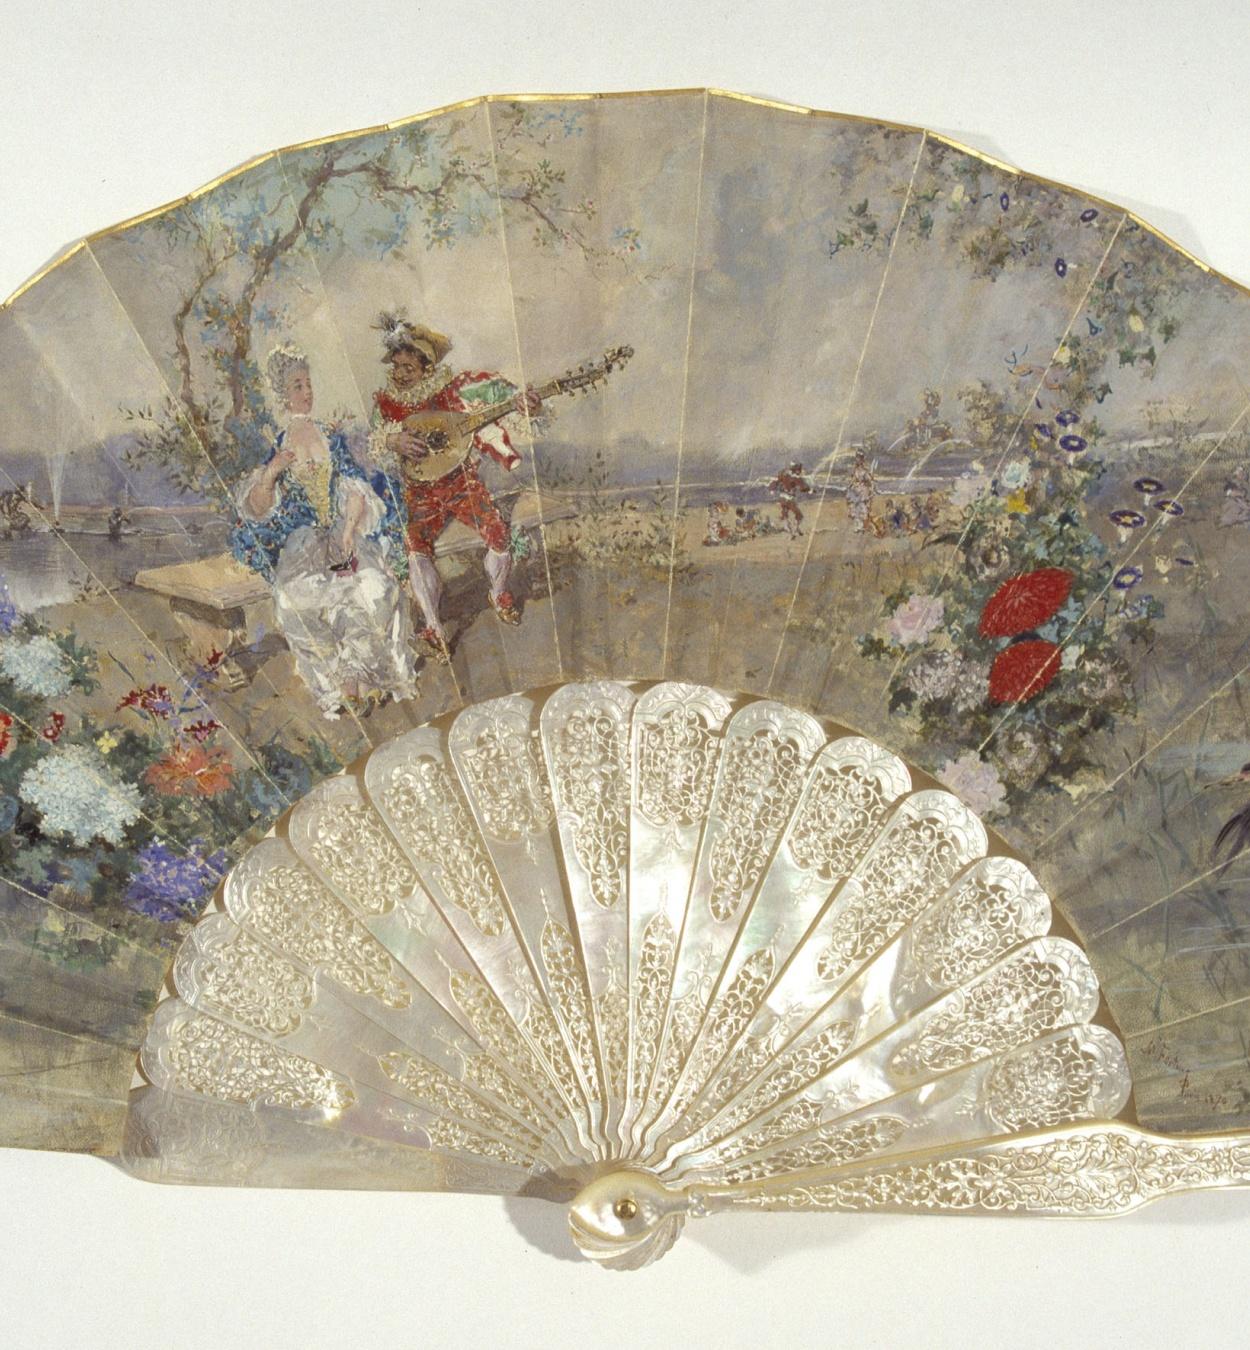 Marià Fortuny - Fan with scene of gallantry - Paris, 1870